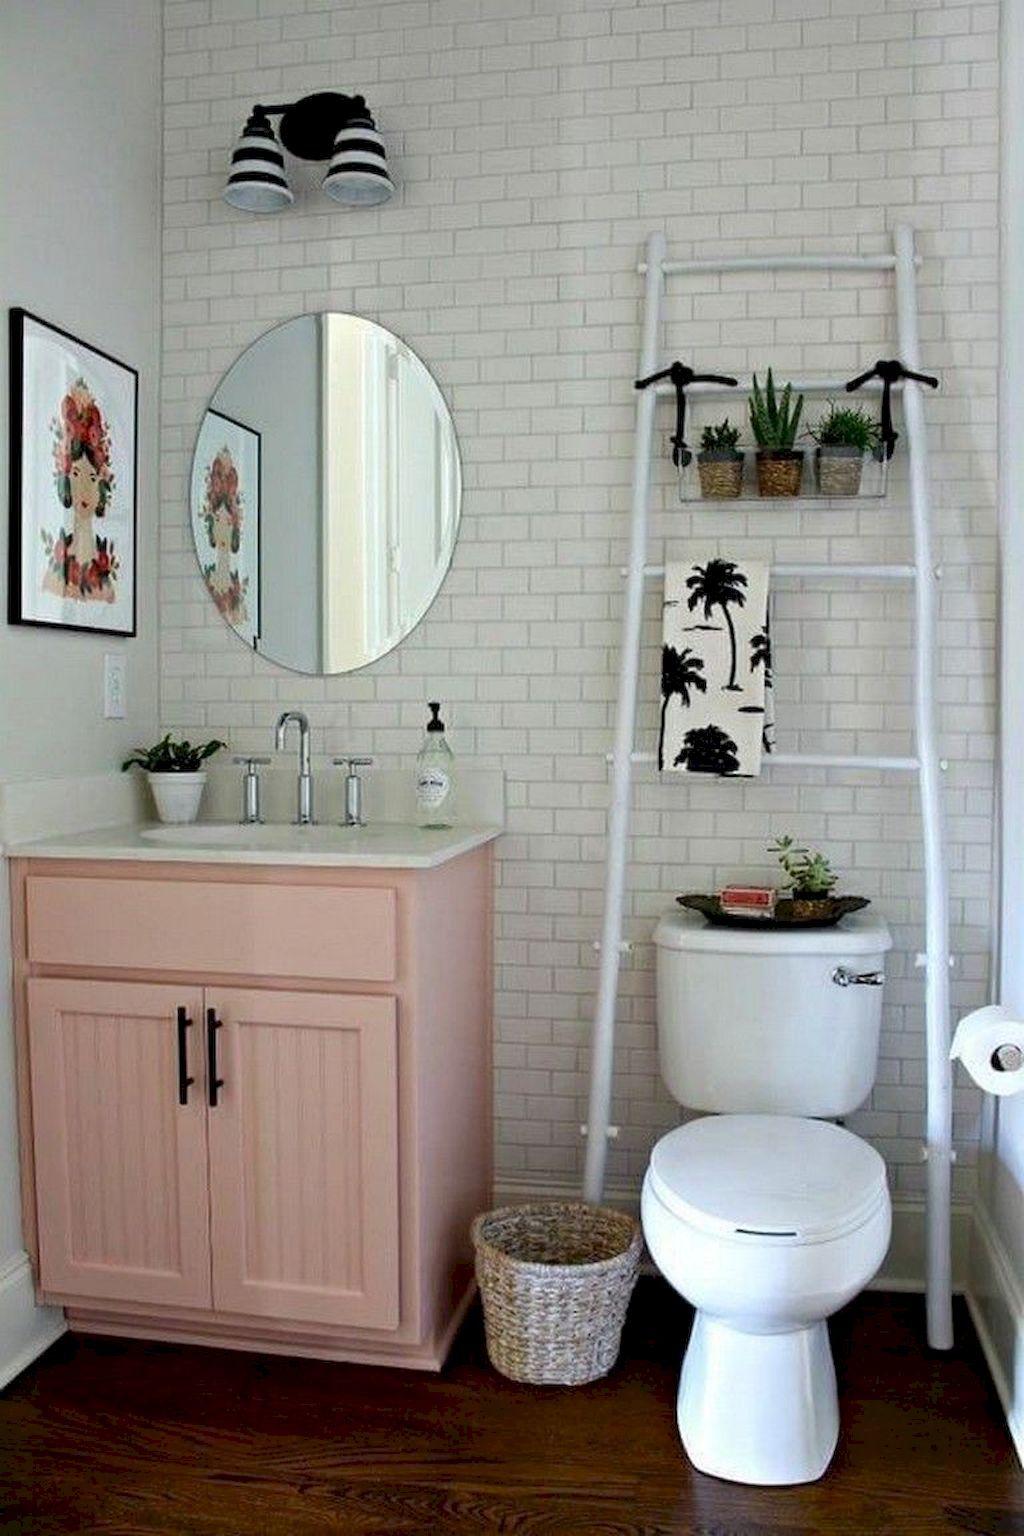 65 First Apartment Decorating Ideas On A Budget First Apartment Decorating Cute Bathroom Ideas Diy Bathroom Decor